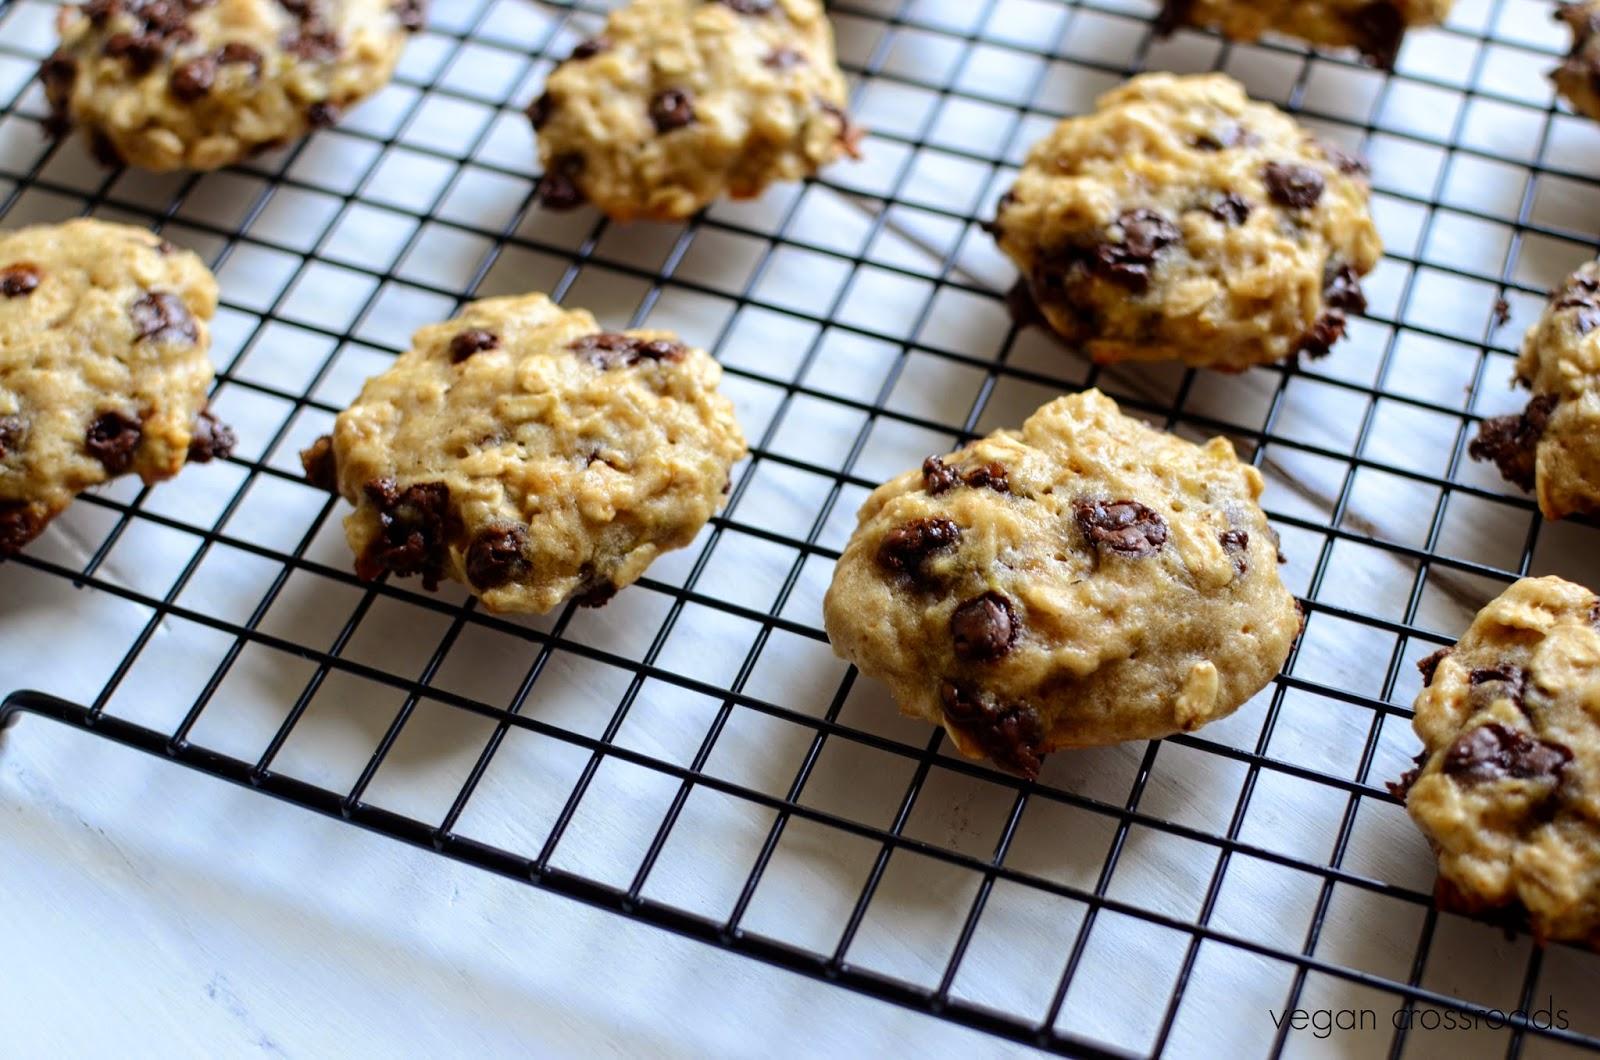 vegane bananen haferflocken kekse mit schokotropfen vegan chocolate chip banana oatmeal. Black Bedroom Furniture Sets. Home Design Ideas